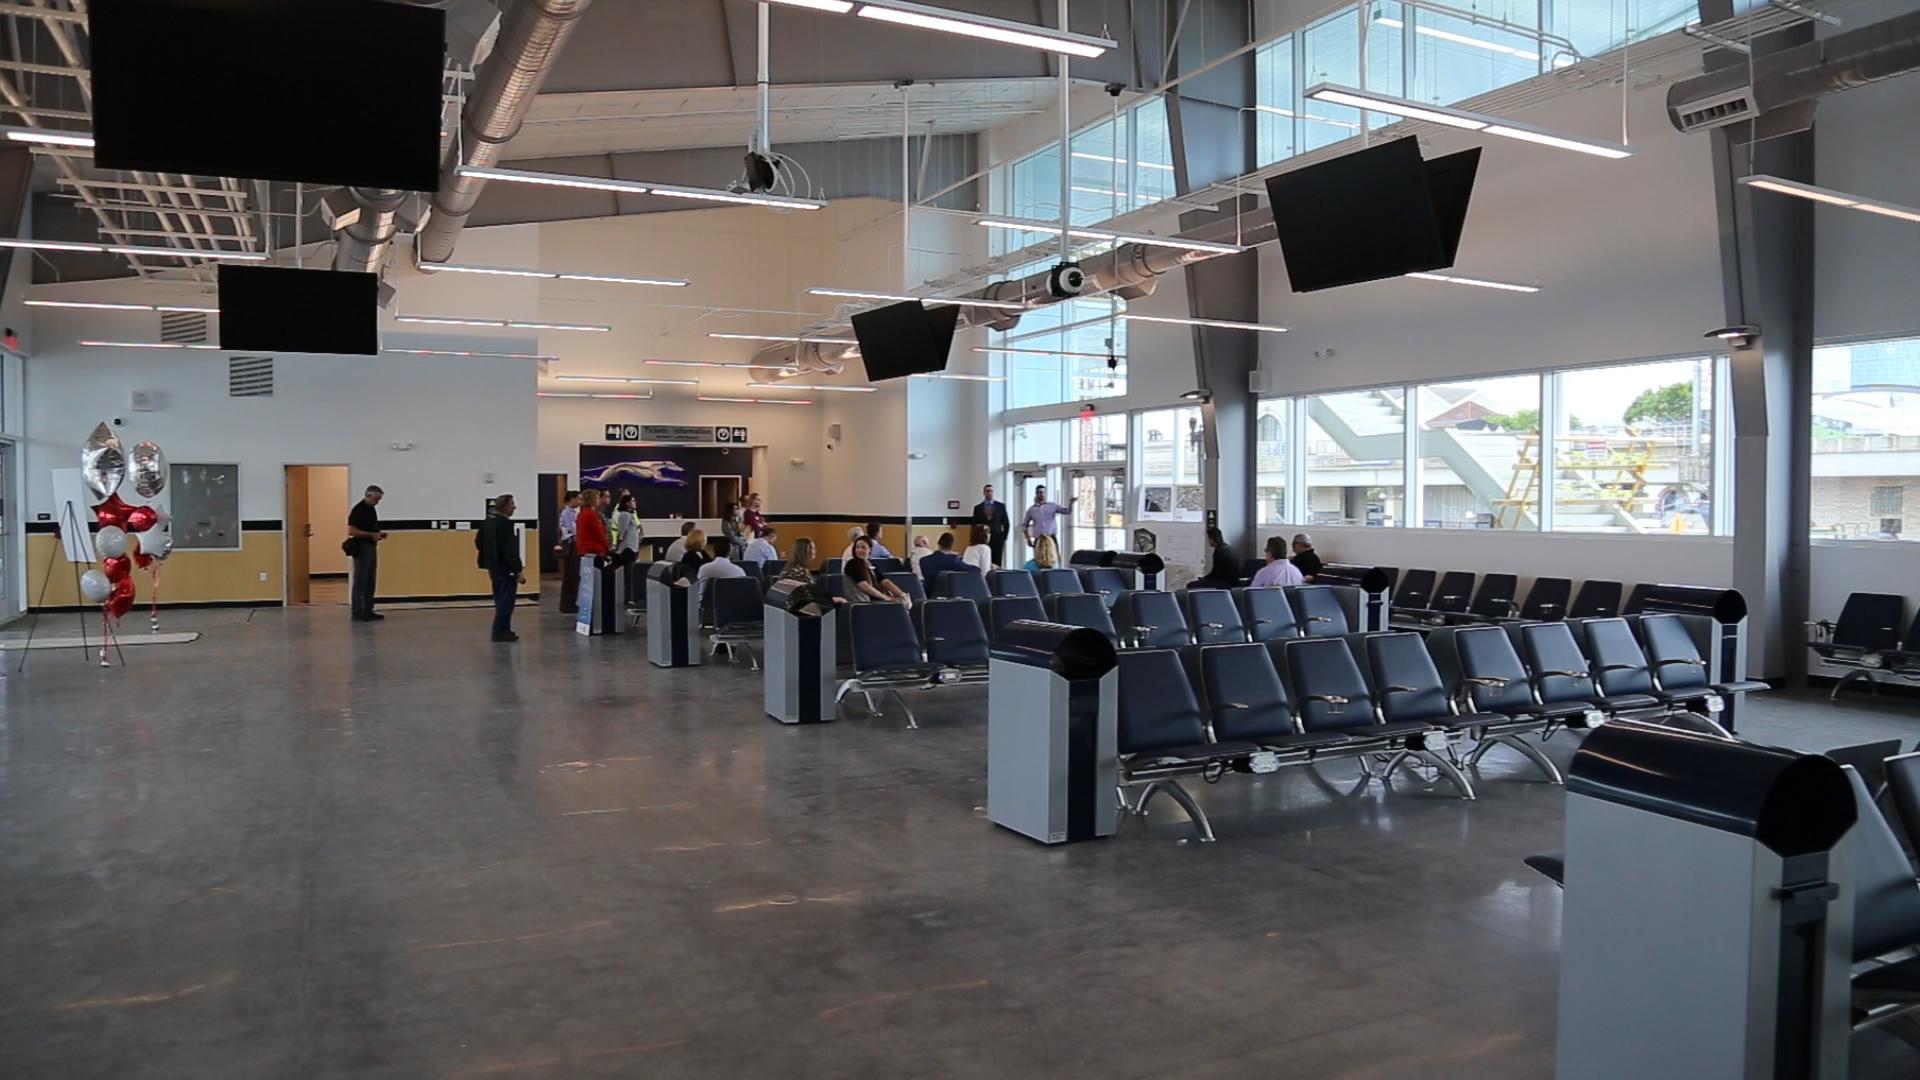 Video New Downtown Greyhound Bus Terminal Opens Next Week